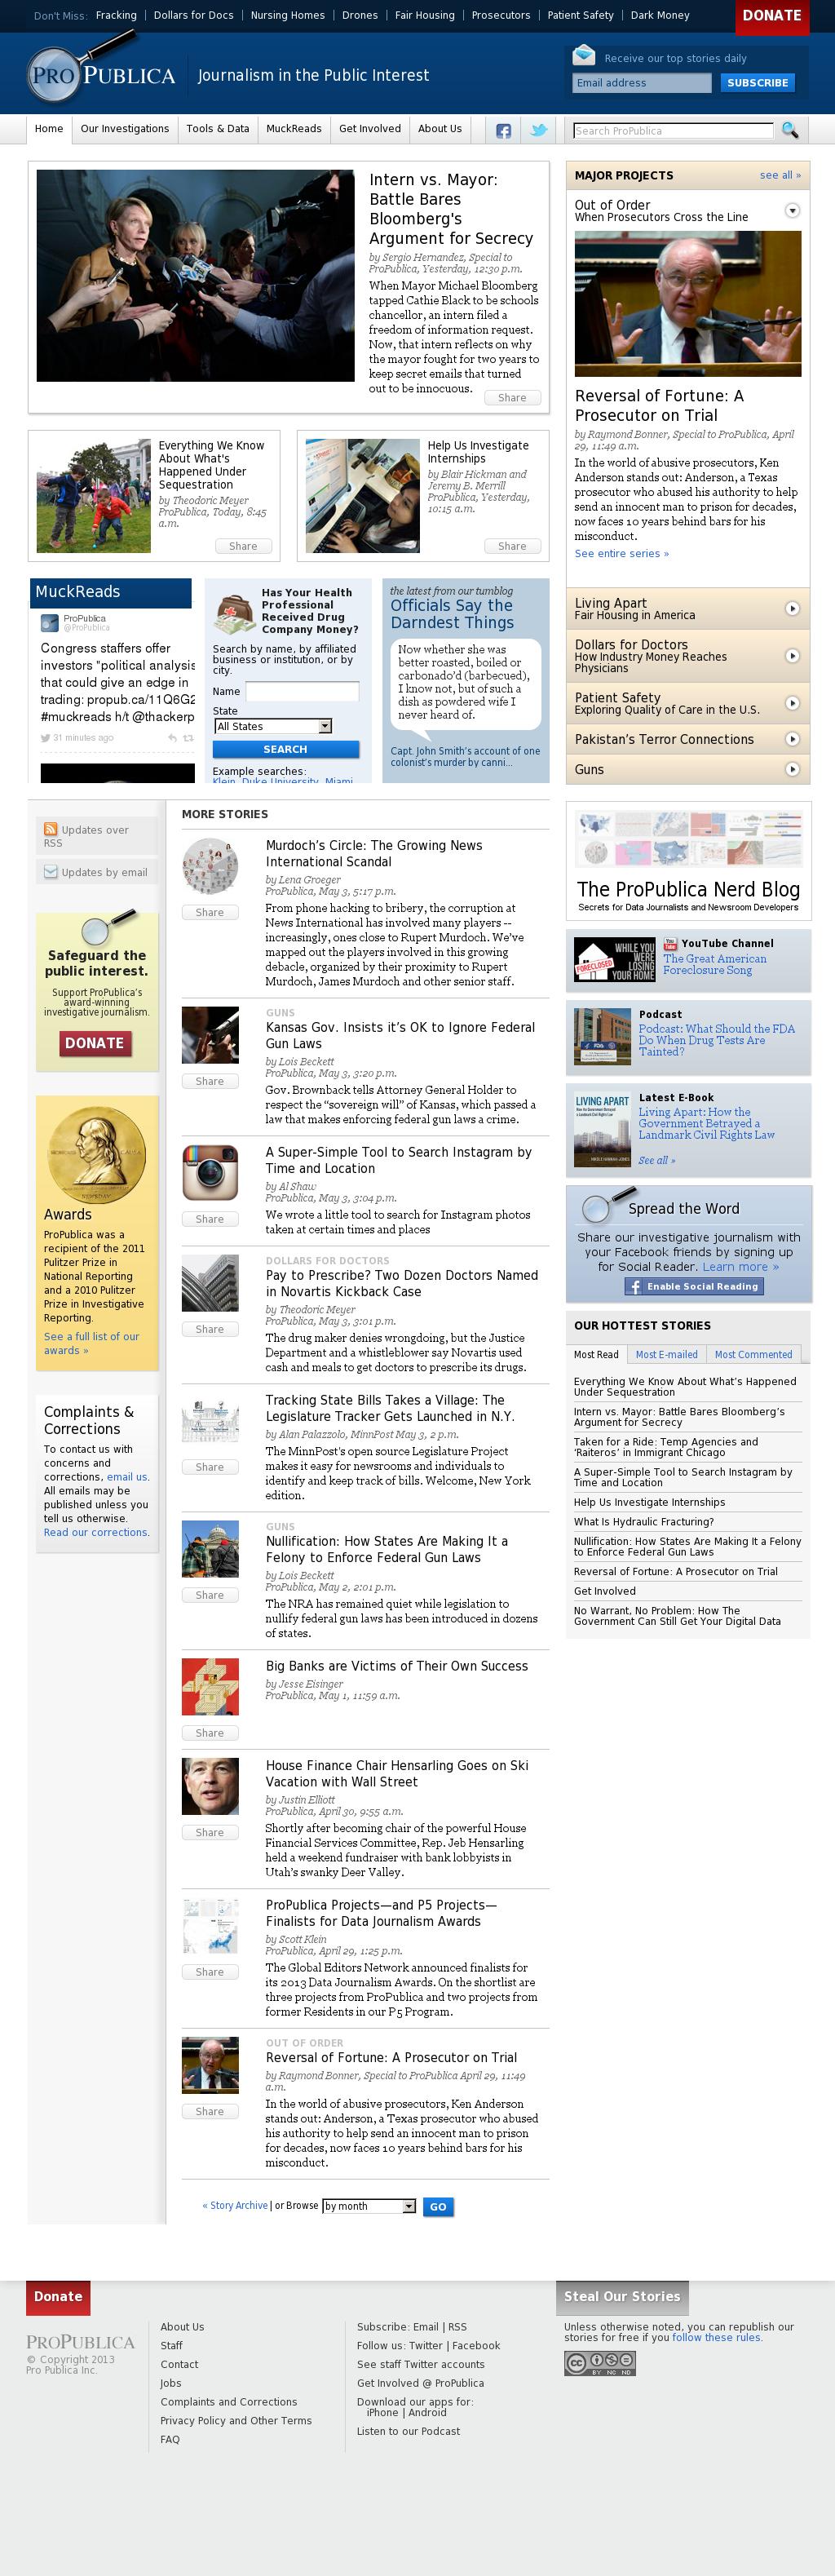 ProPublica at Tuesday May 7, 2013, 6:21 p.m. UTC